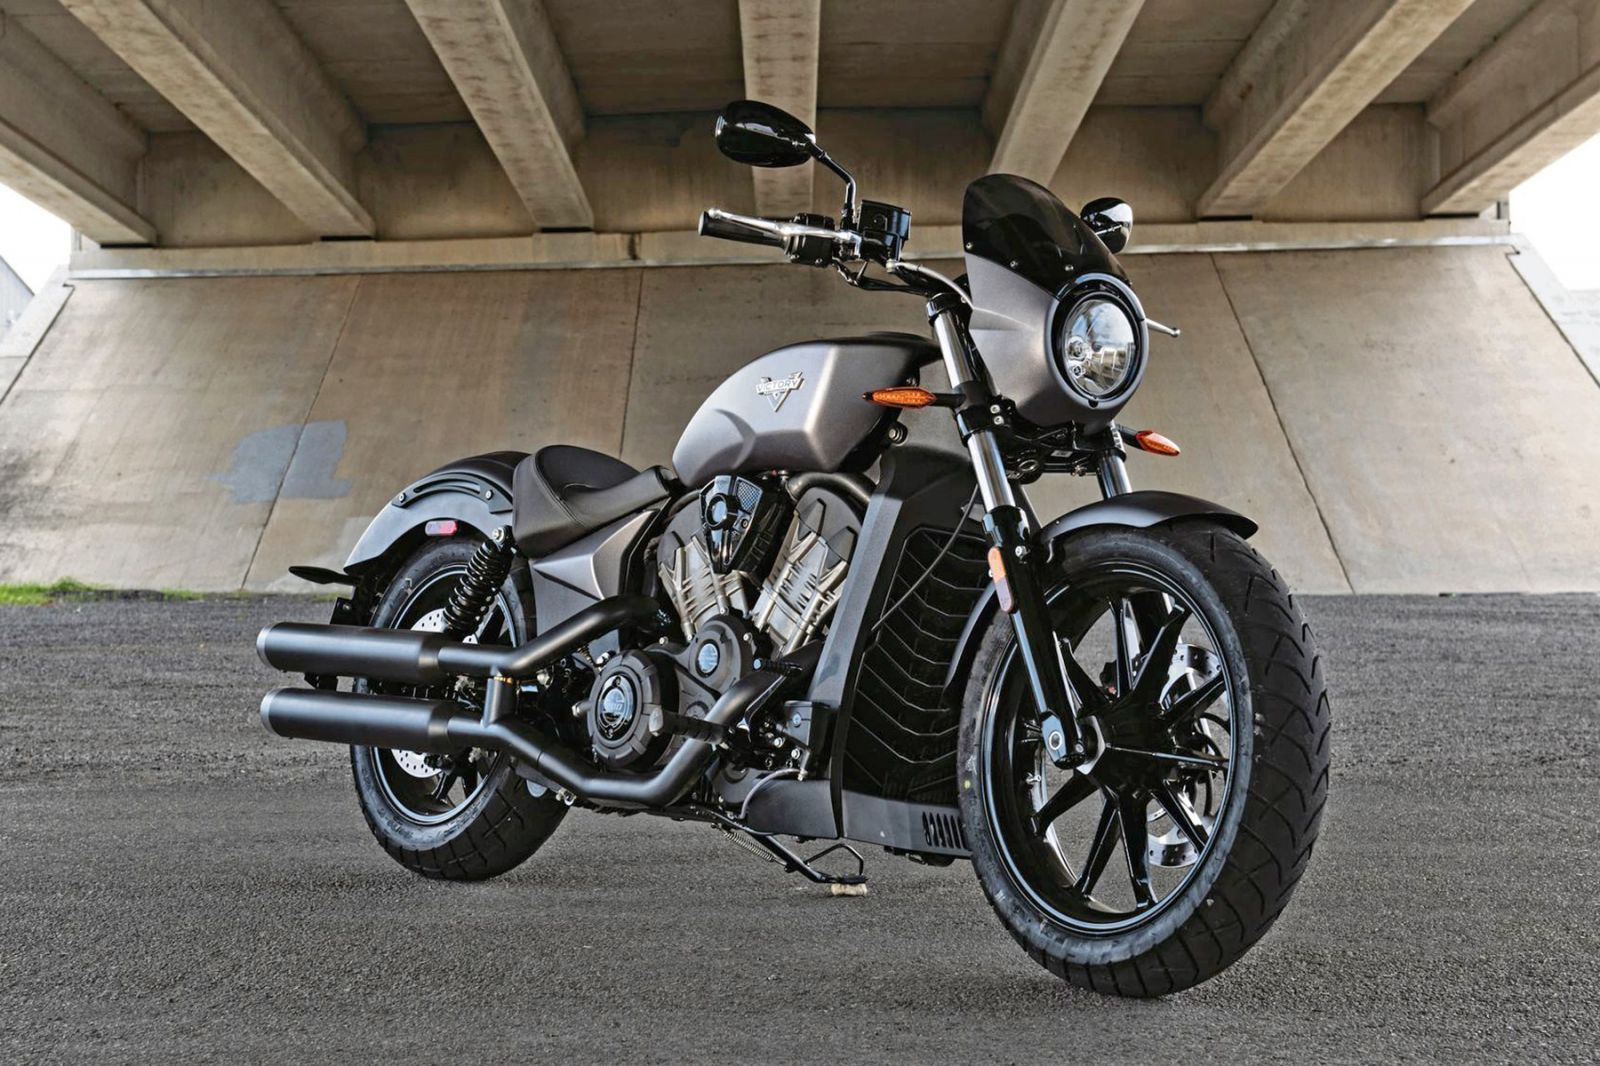 occasion motos marseille centre harley davidson motos moto scooter motos d 39 occasion. Black Bedroom Furniture Sets. Home Design Ideas